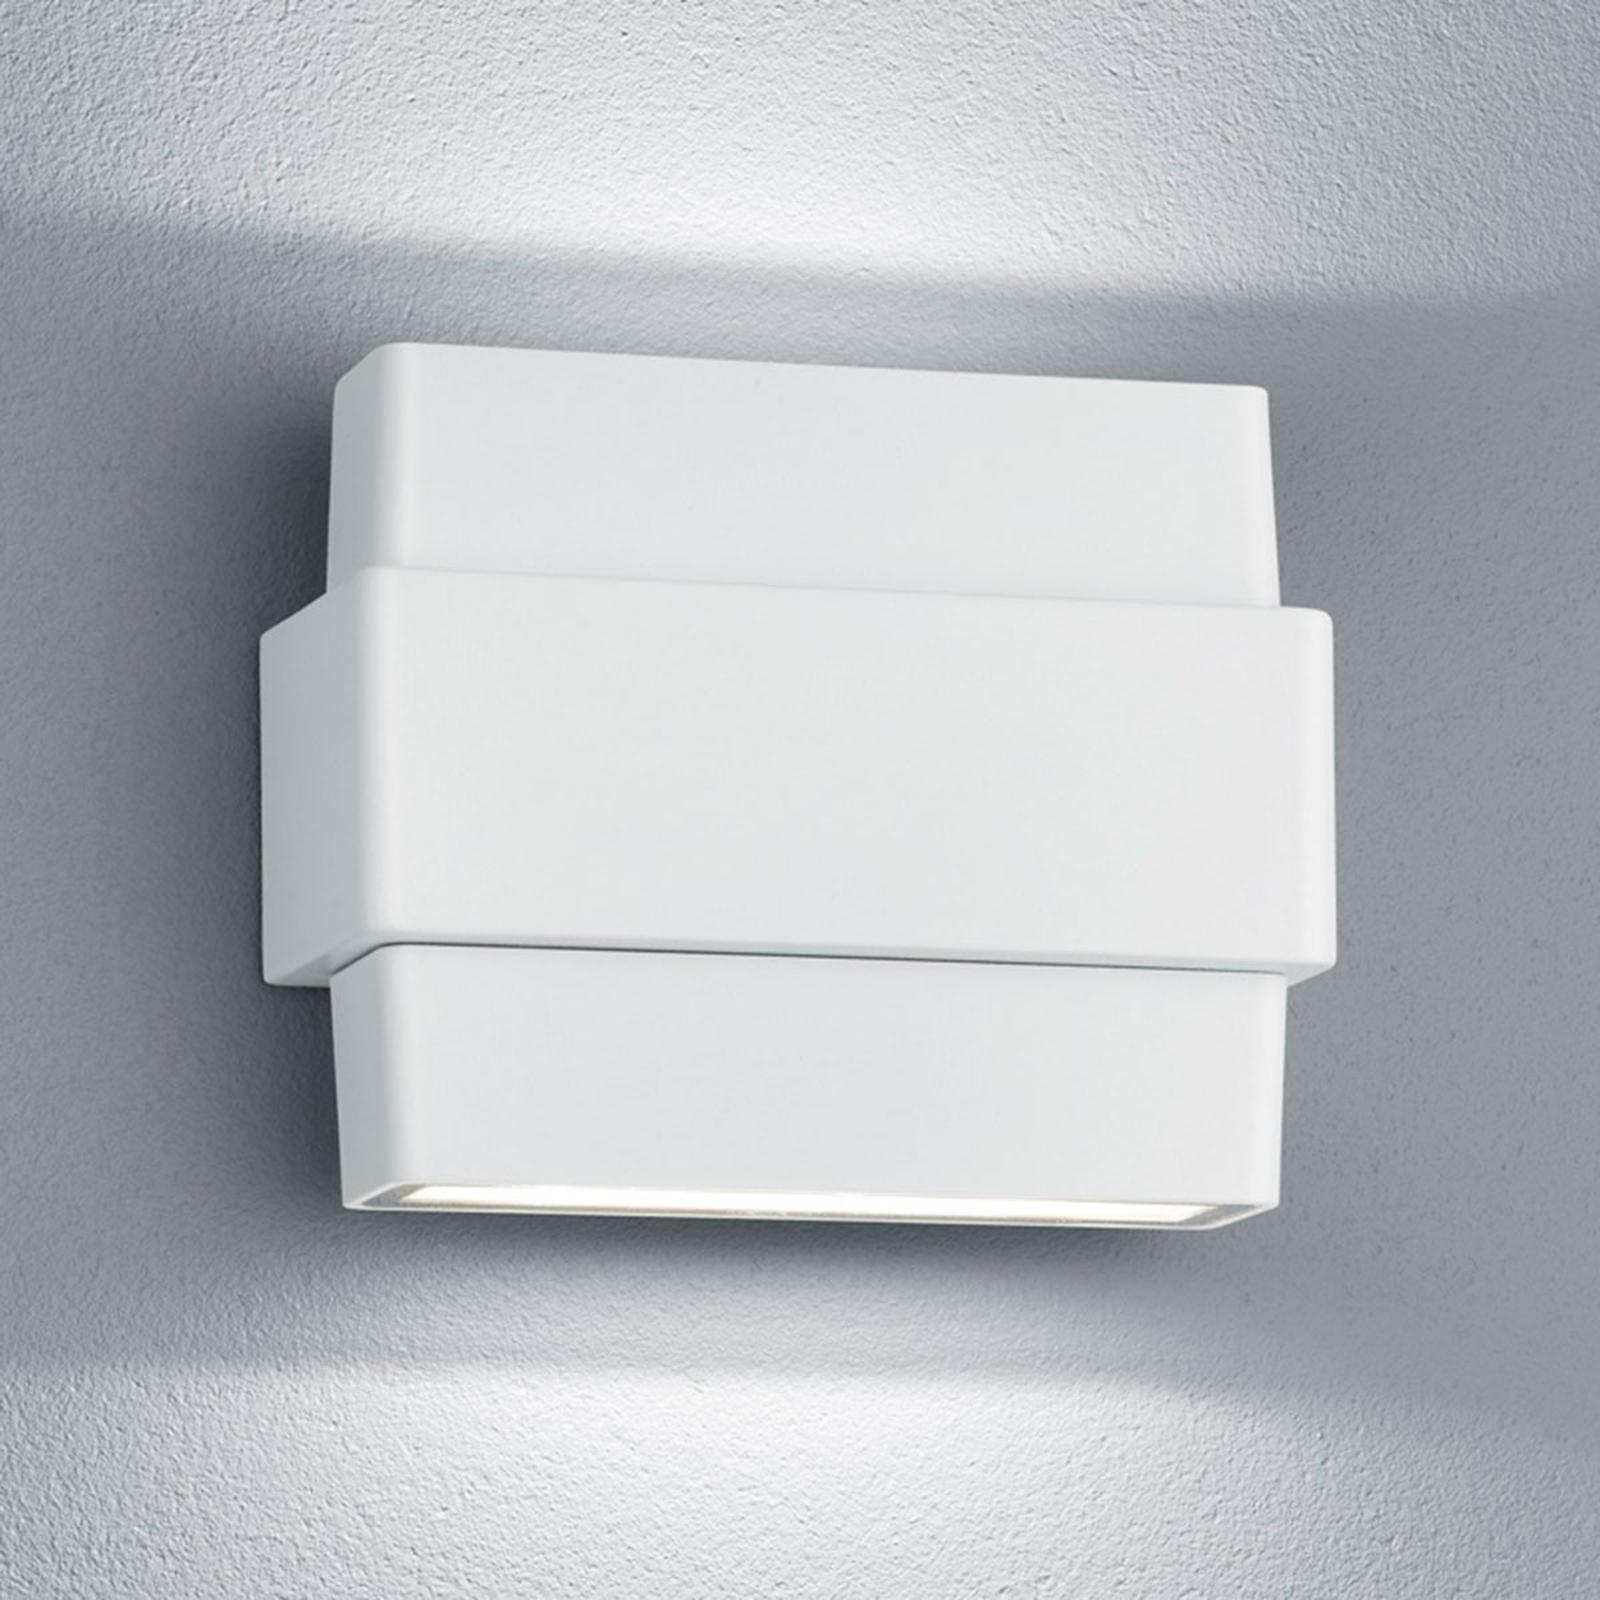 Verstellbare LED Außenwandleuchte Padma | Lampenwelt.at